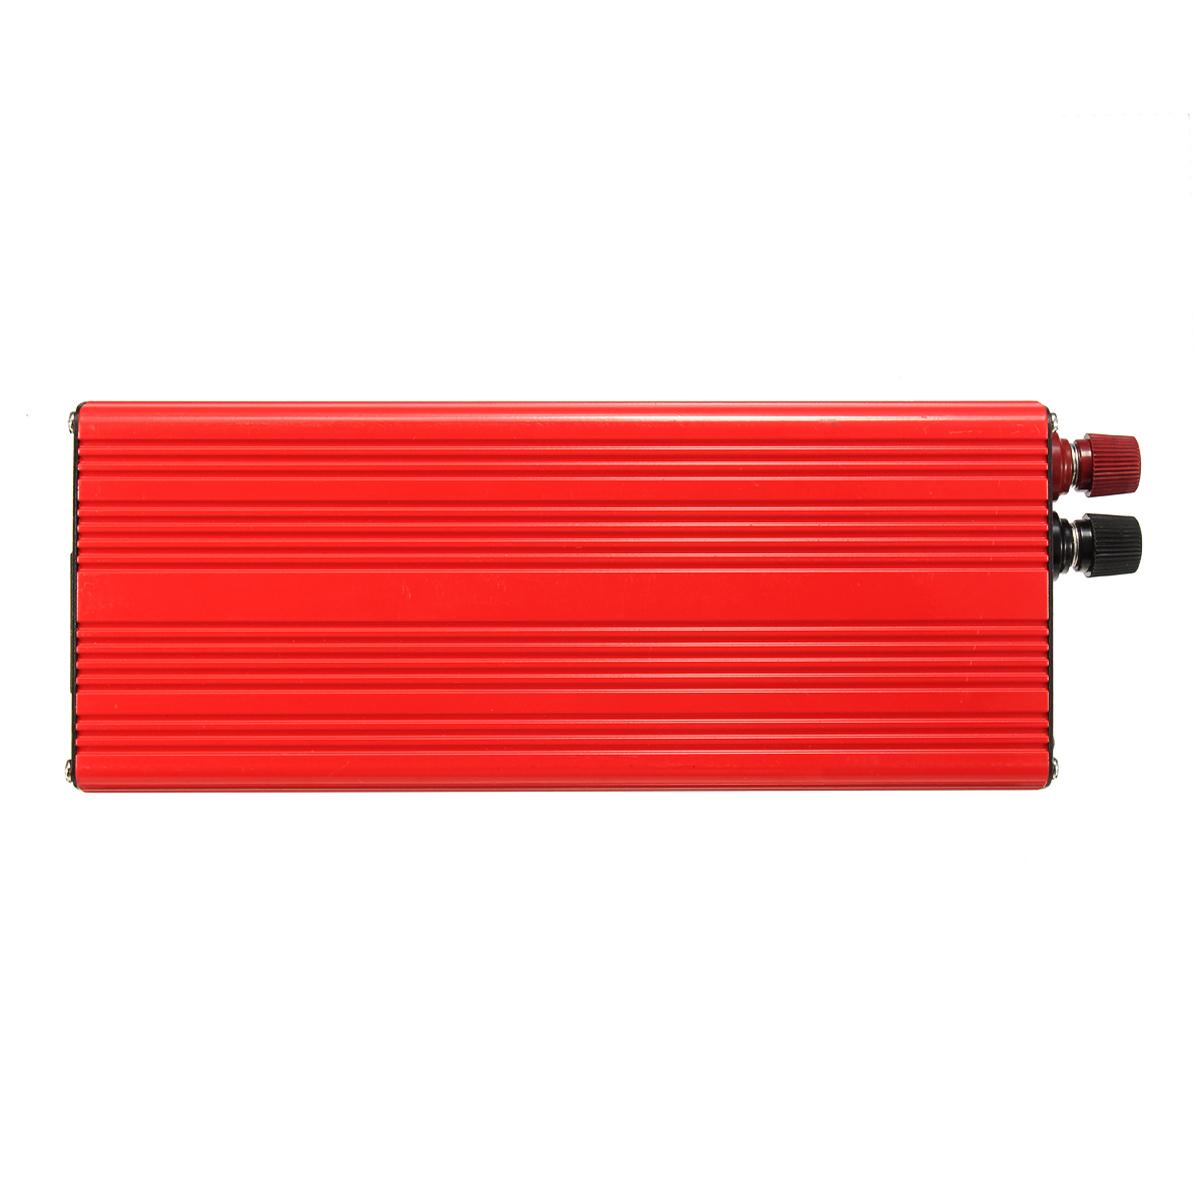 6000W Peak Solar Power Inverter DC 12V/24V to AC 220V/110V USB Modified Sine Wave Converter